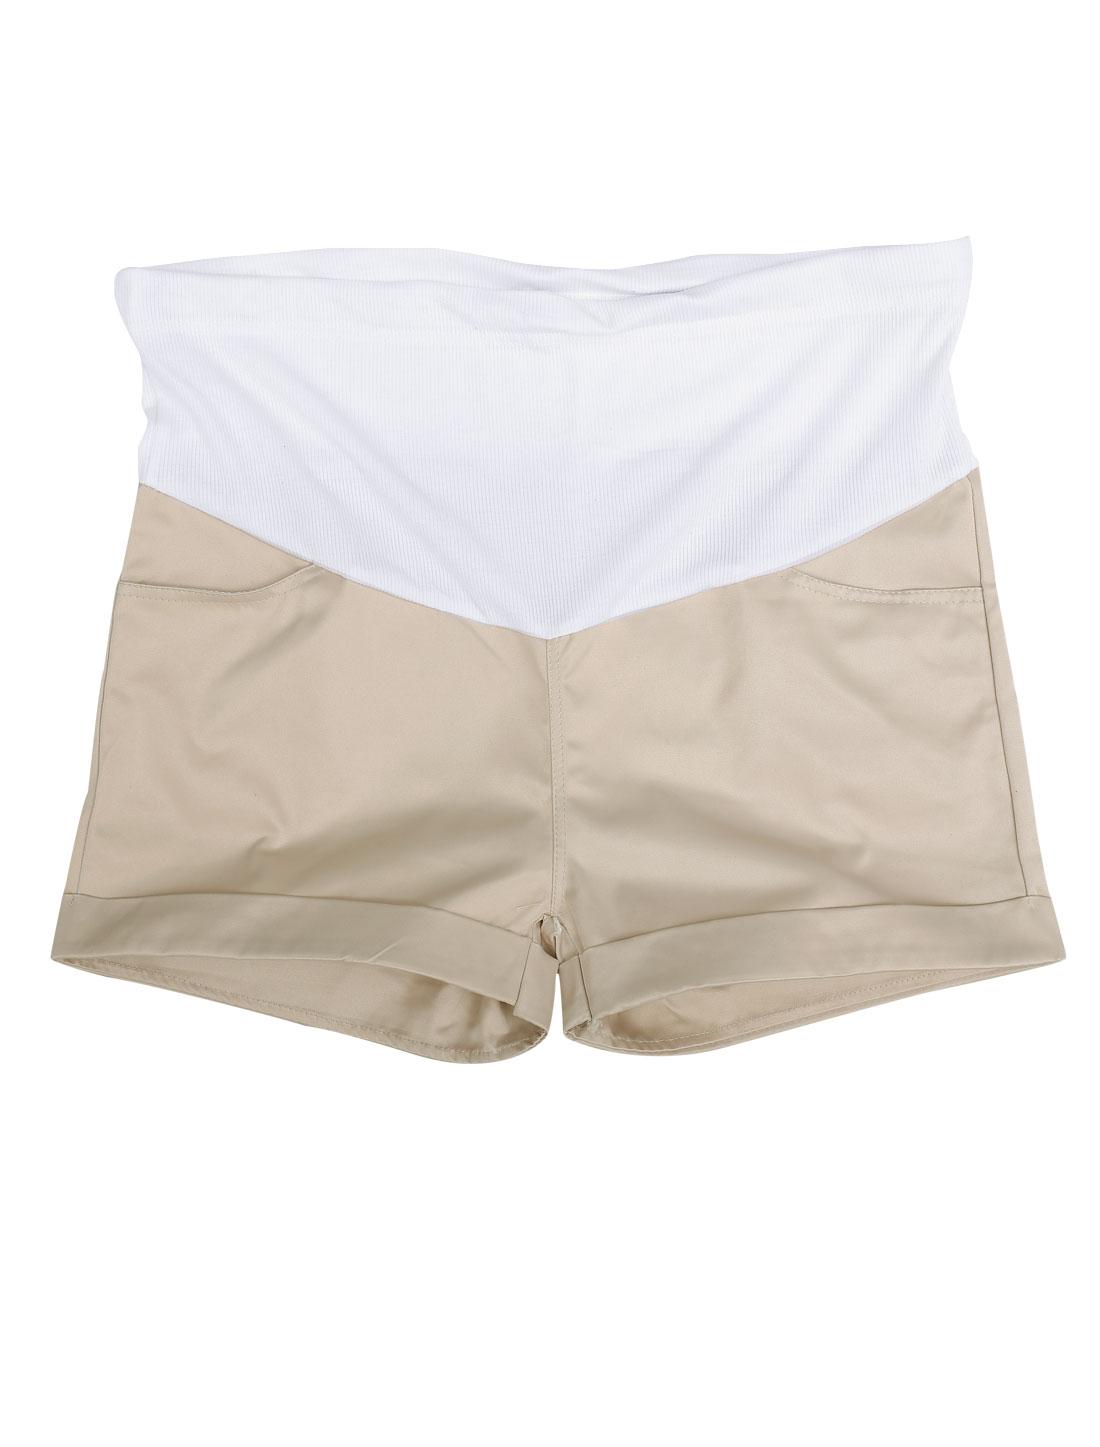 Motherhood Elastic Waistband Two Front Pockets Summer Shorts Khaki S